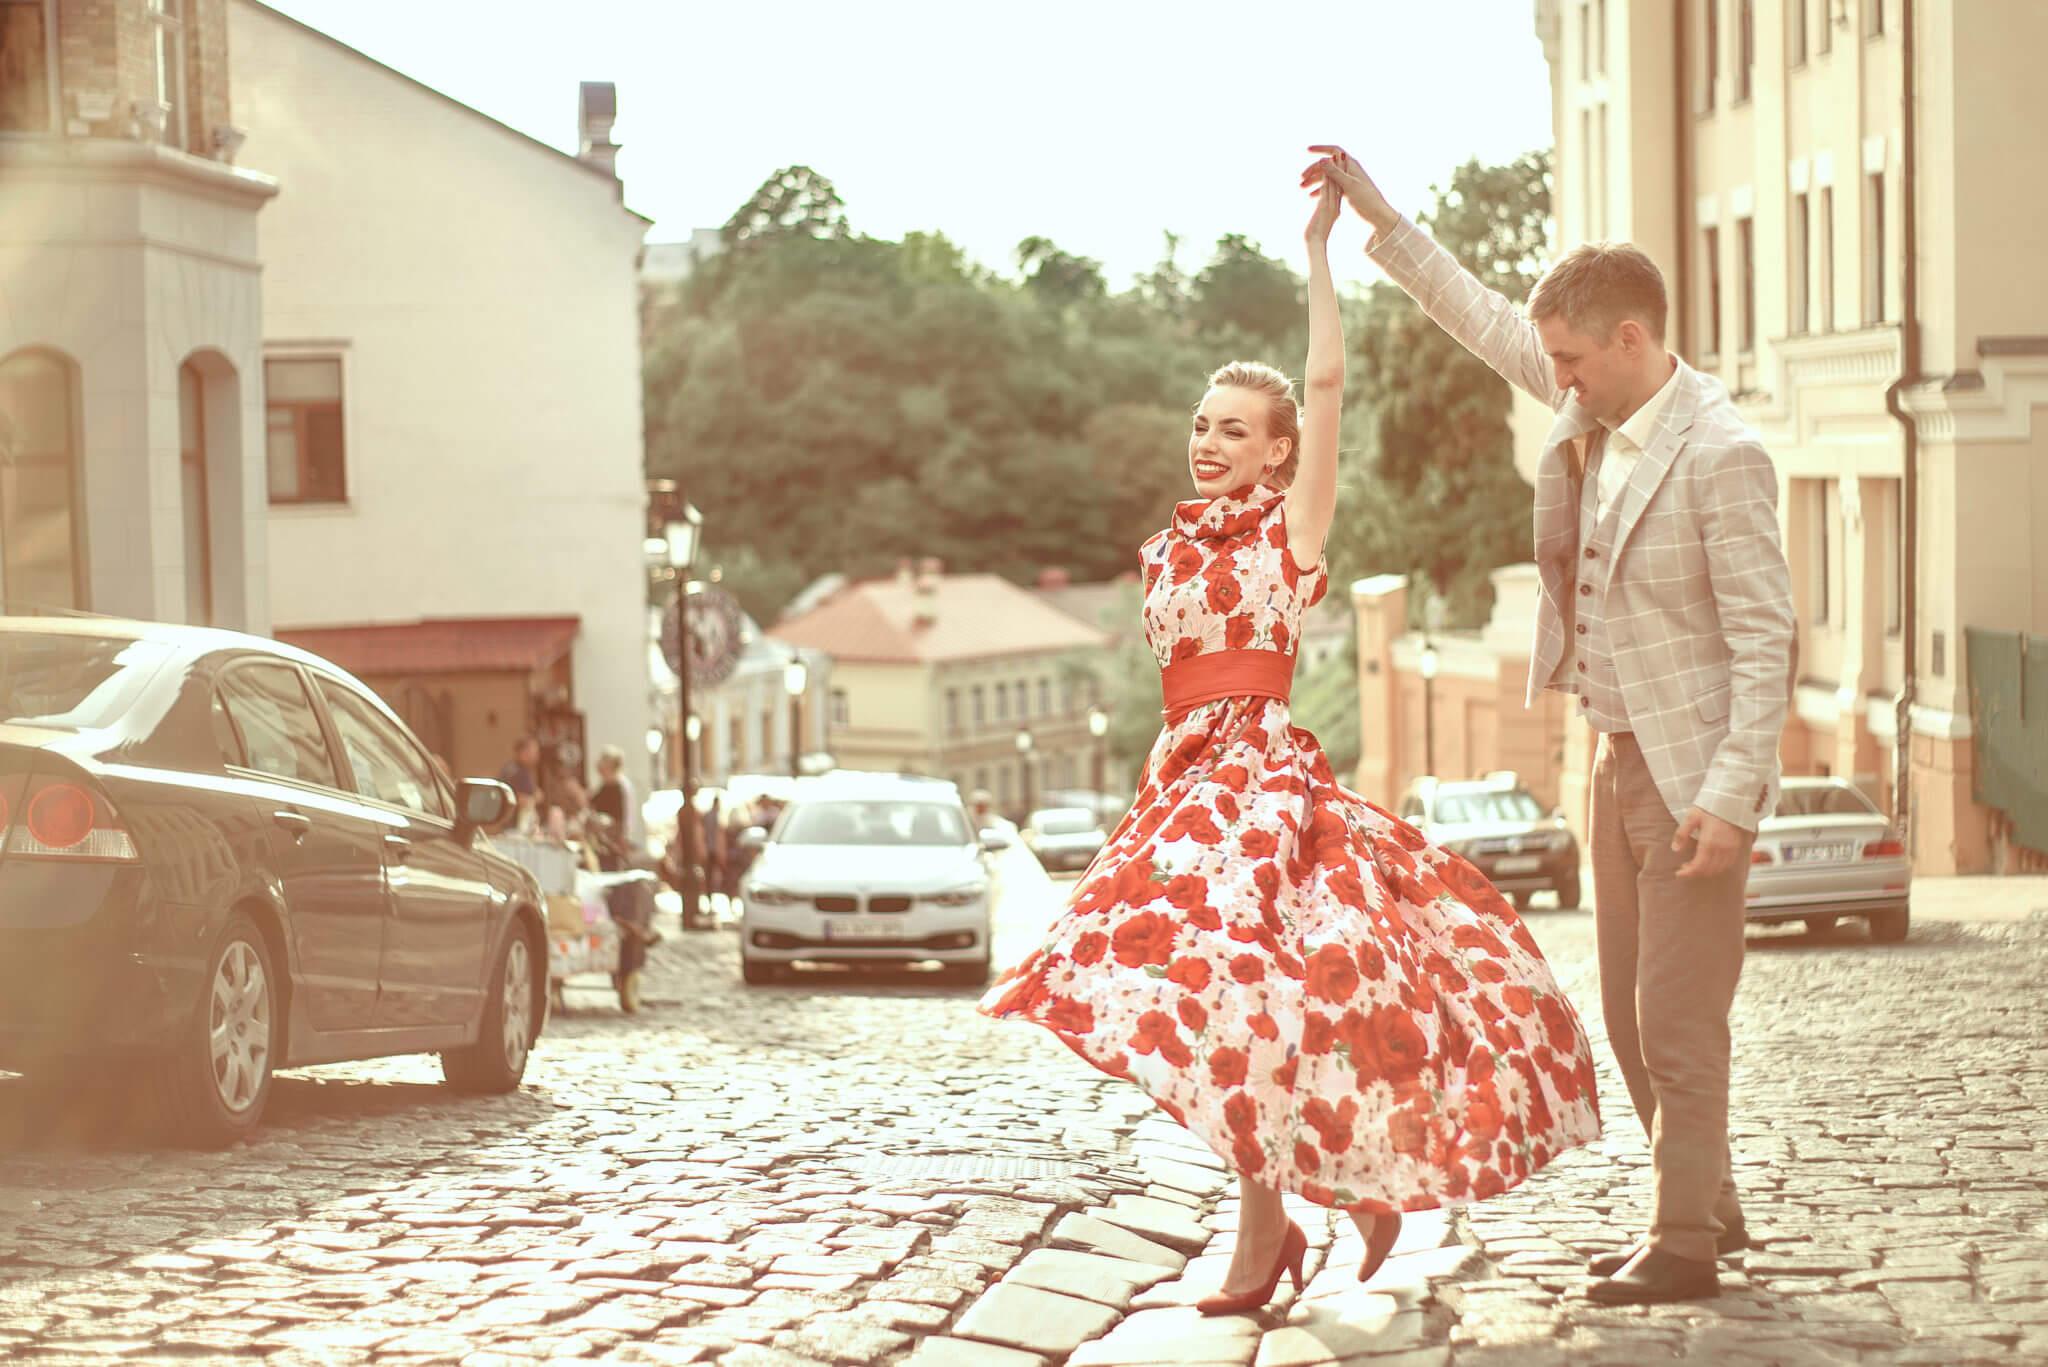 Love story фотосессия на природе, прогулка по городу, Андреевский спуск, закат, пара кружится в танце, ph Постникова Алиса